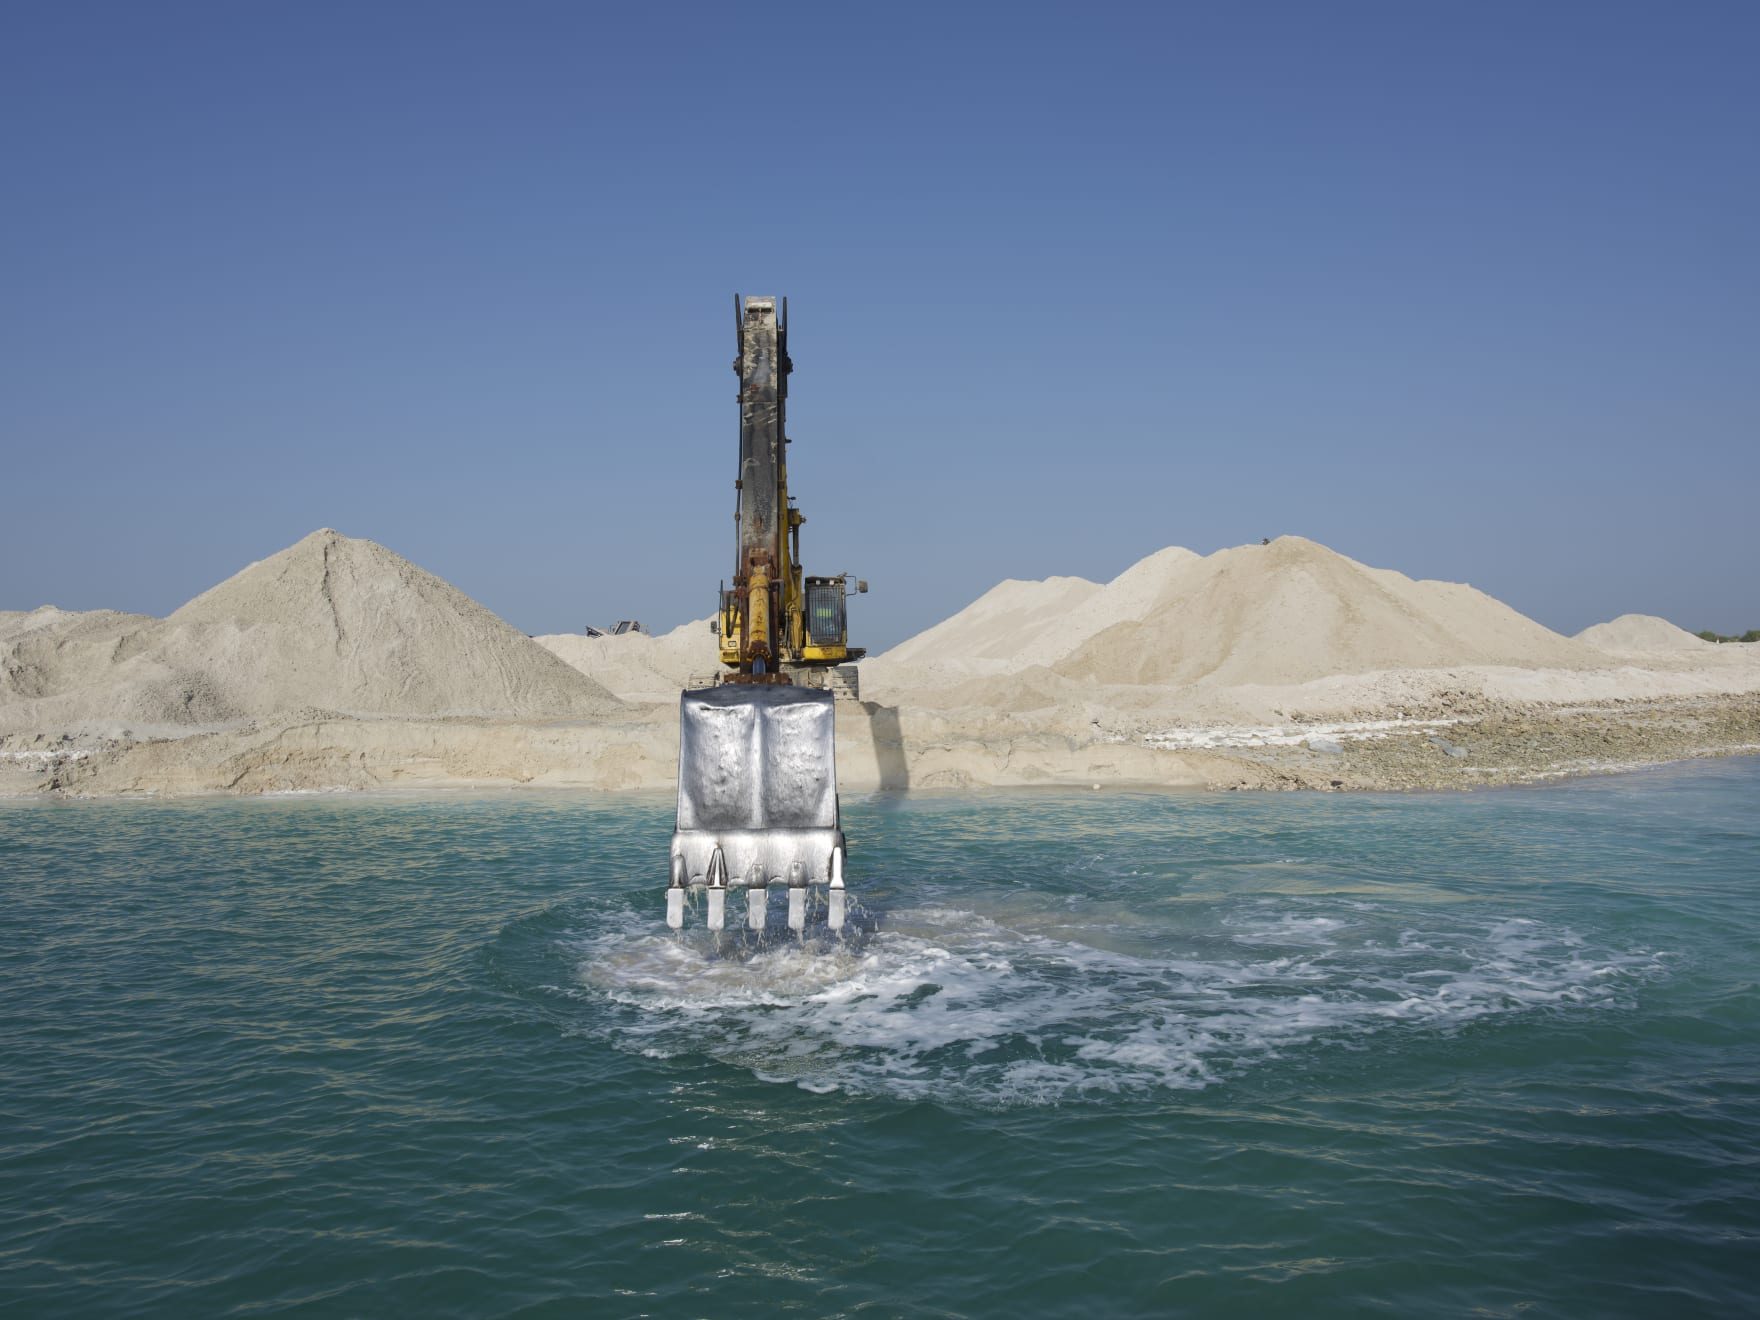 Tarek Al-Ghoussein, Abu Dhabi Archipelago (Island Making 2), 2015-, Digital Print, 60 x 80cm, Edition of 6 + 1AP USD 8,000 (Excluding VAT)